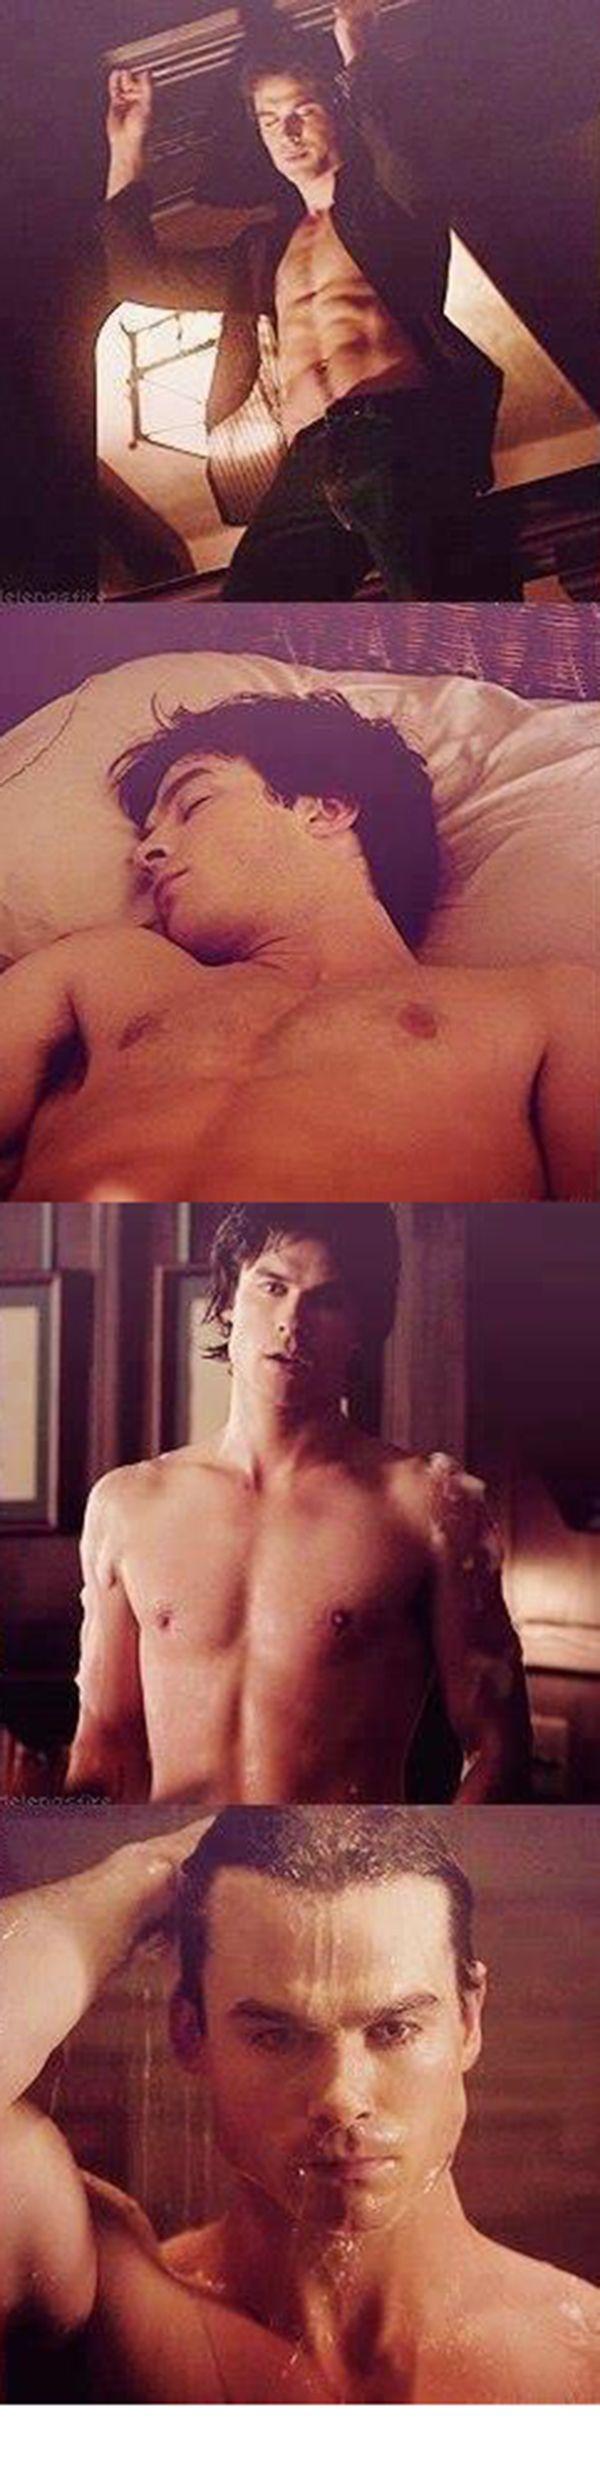 Ian Somerhalder as Damon Salvatore in The Vampire Diaries